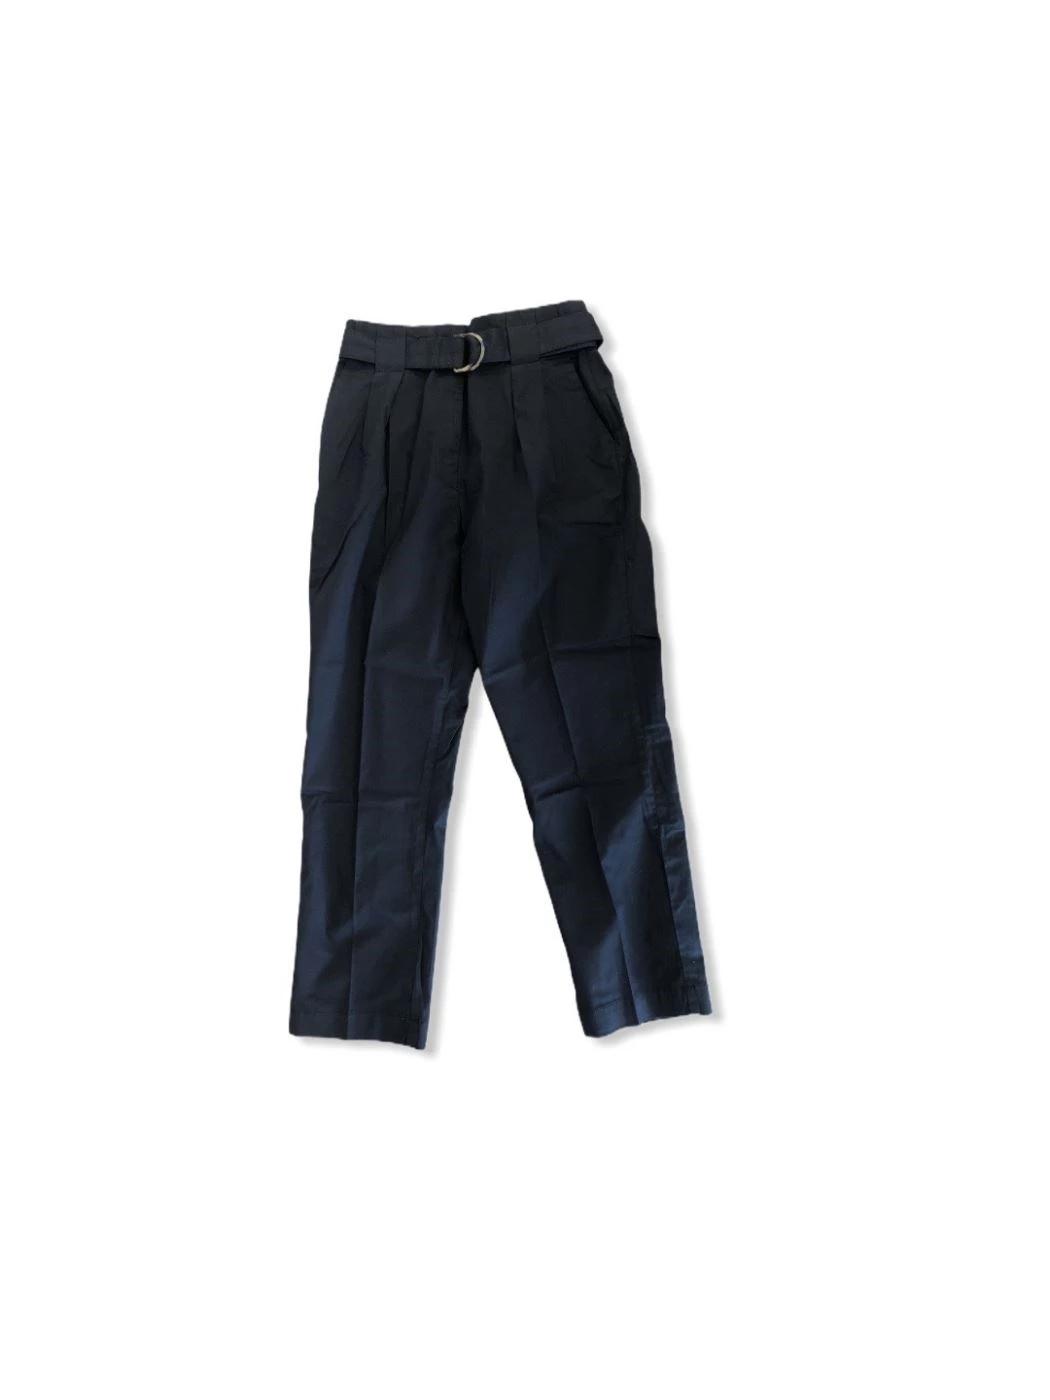 LIU JO pantalone savana FA0311T4140